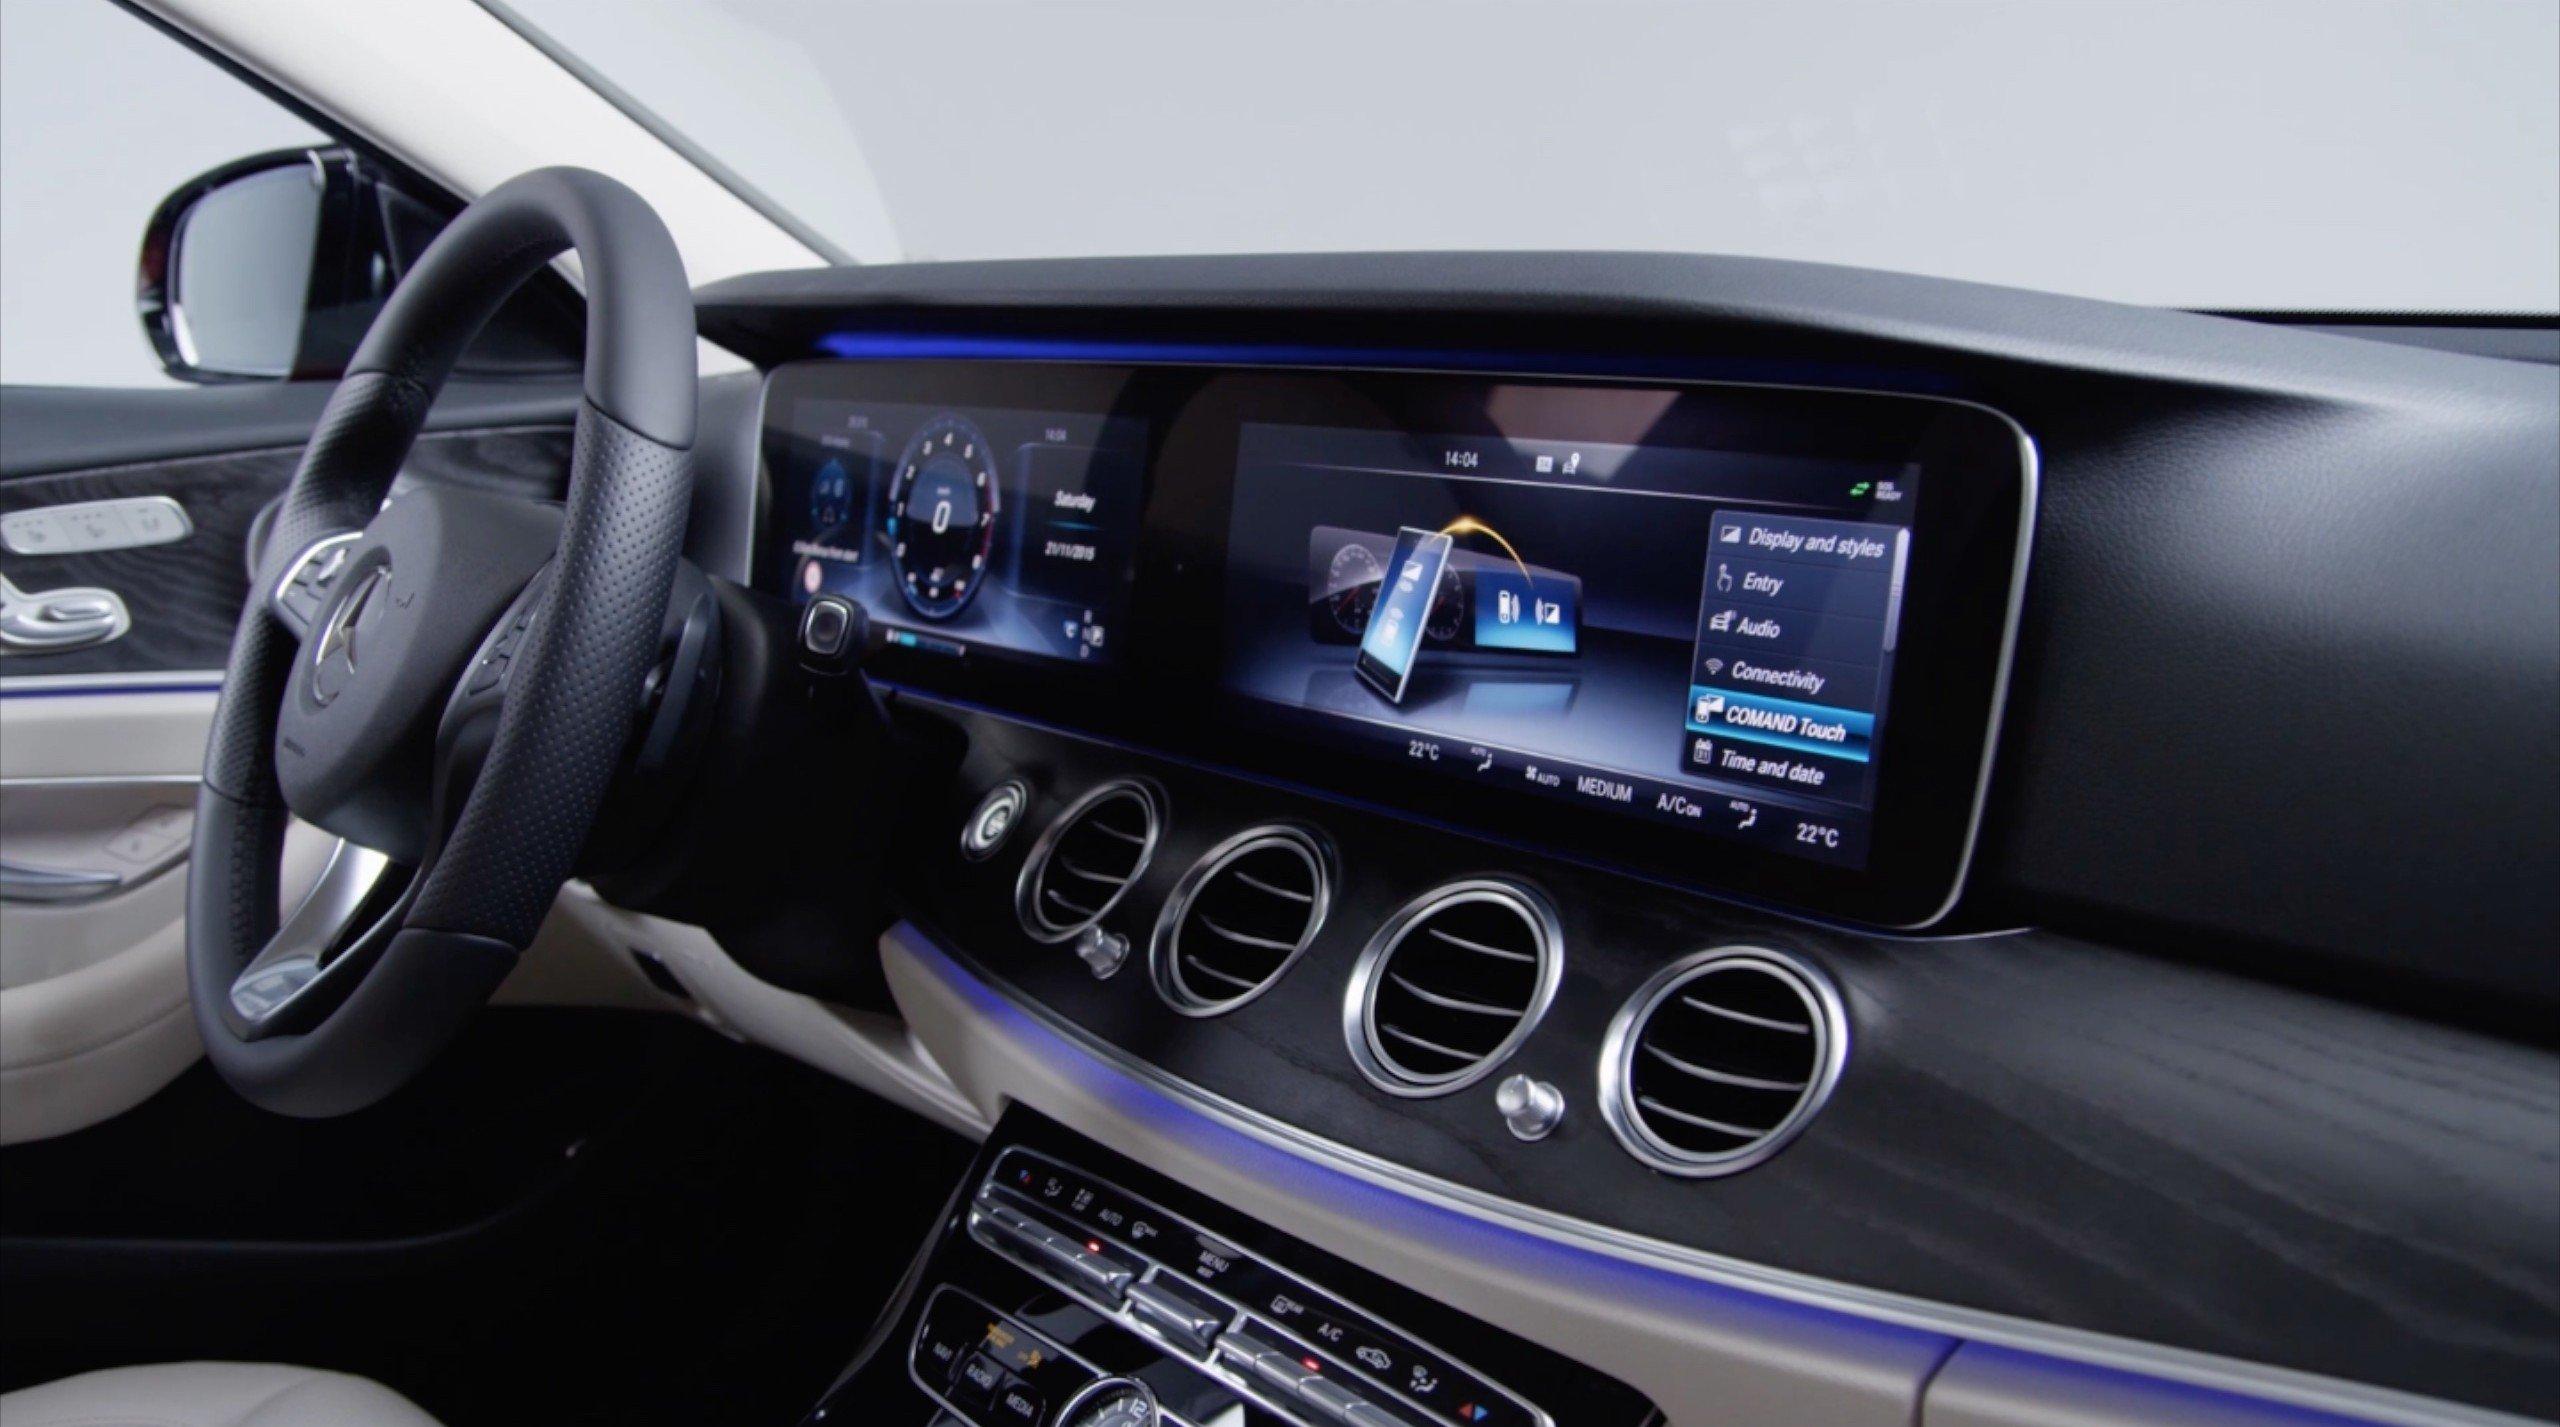 Video w213 mercedes benz e class interior detailed paul for Video mercedes benz